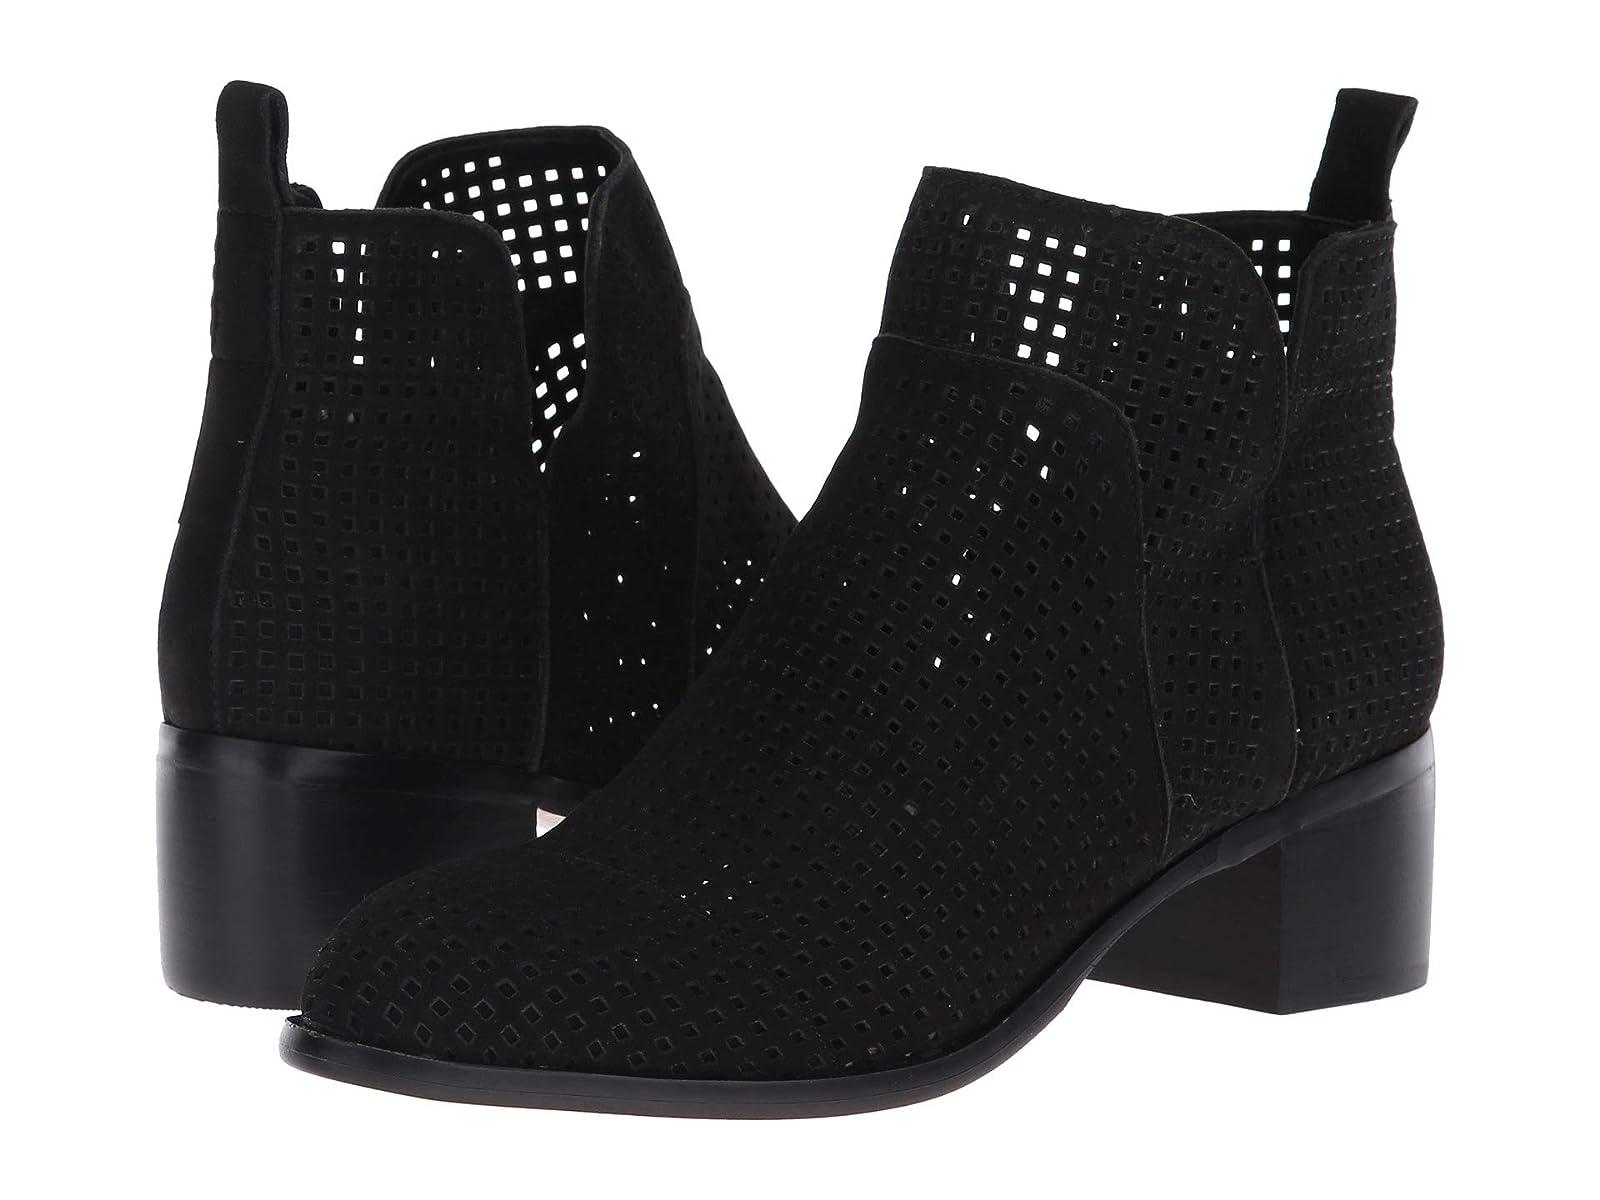 Franco Sarto L-Richland 3Affordable and distinctive shoes